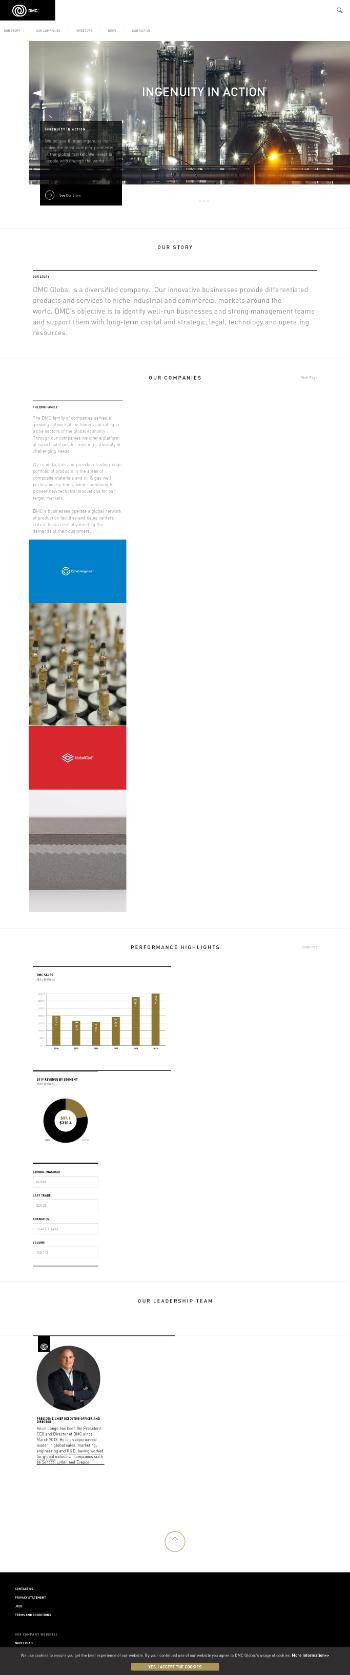 DMC Global Inc. Website Screenshot